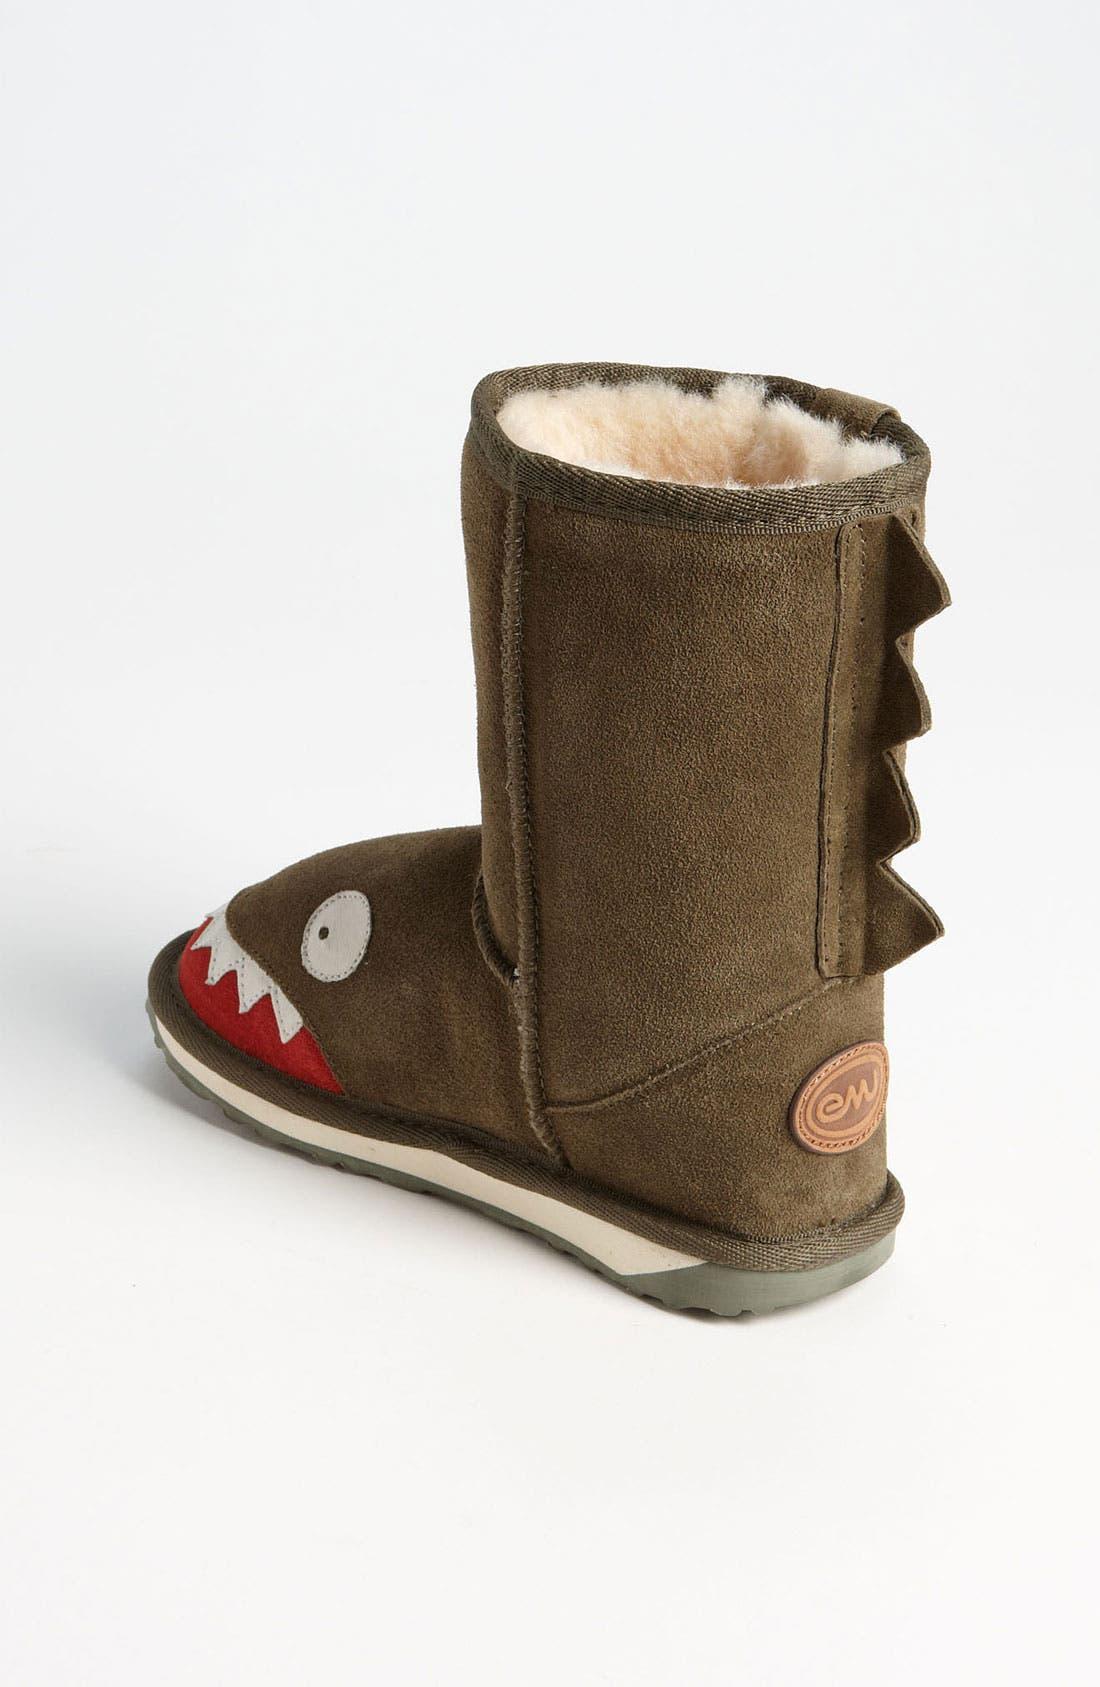 Alternate Image 2  - EMU Australia 'Little Creatures - Croc' Boot (Toddler, Little Kid & Big Kid)